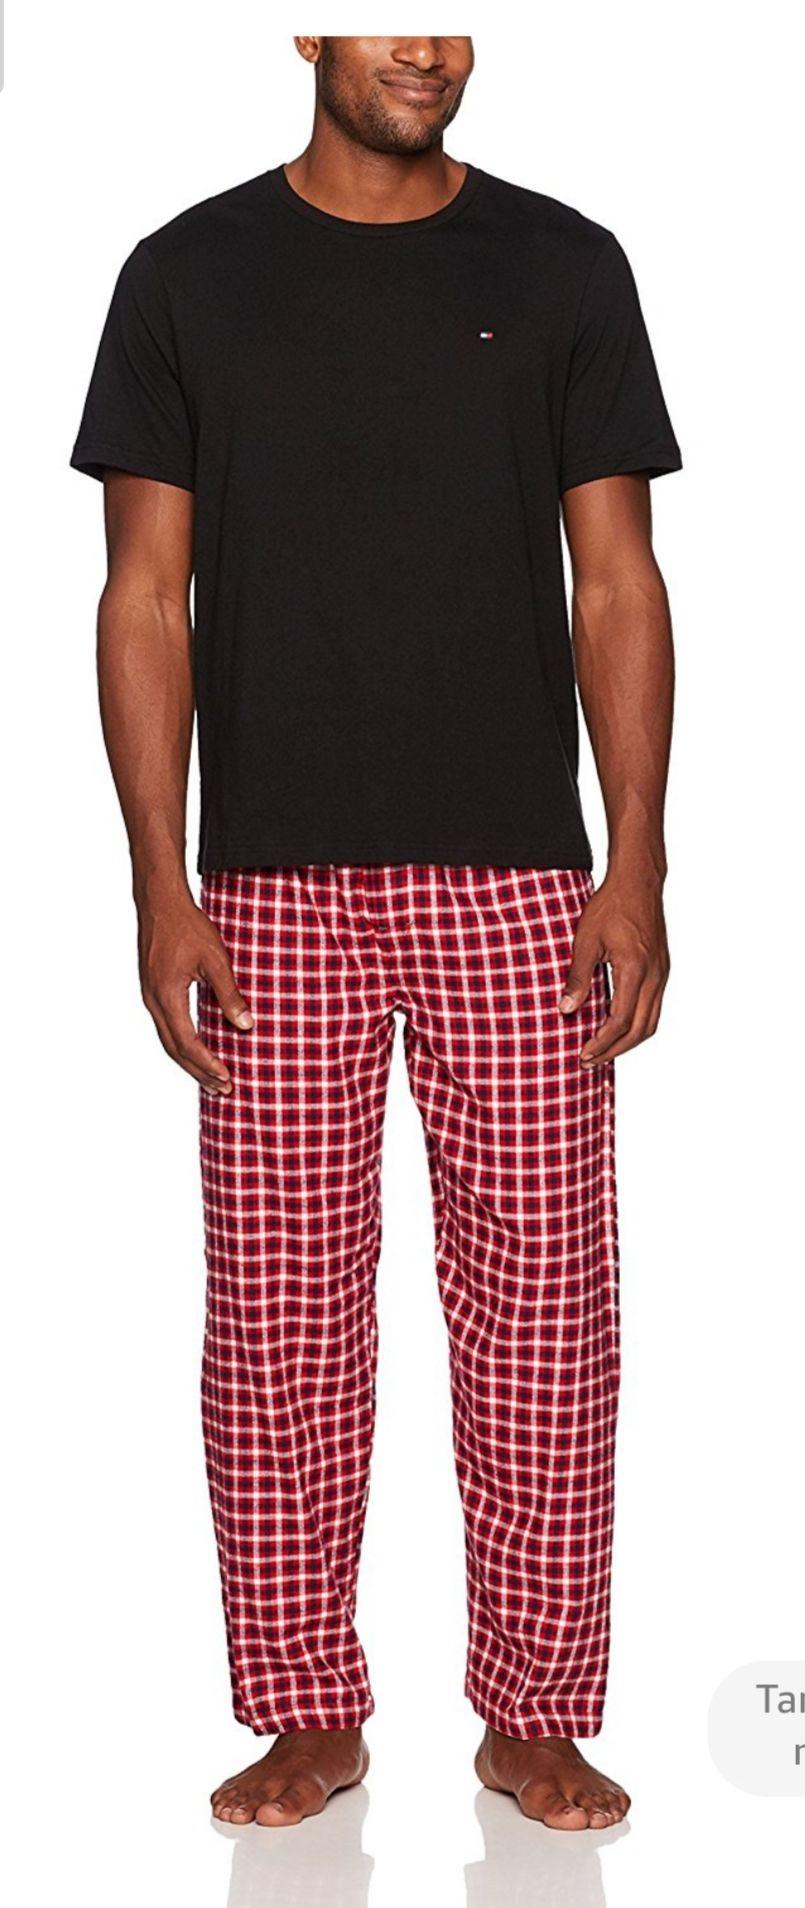 Set pijama Tommy Hilfiger hombre talla L